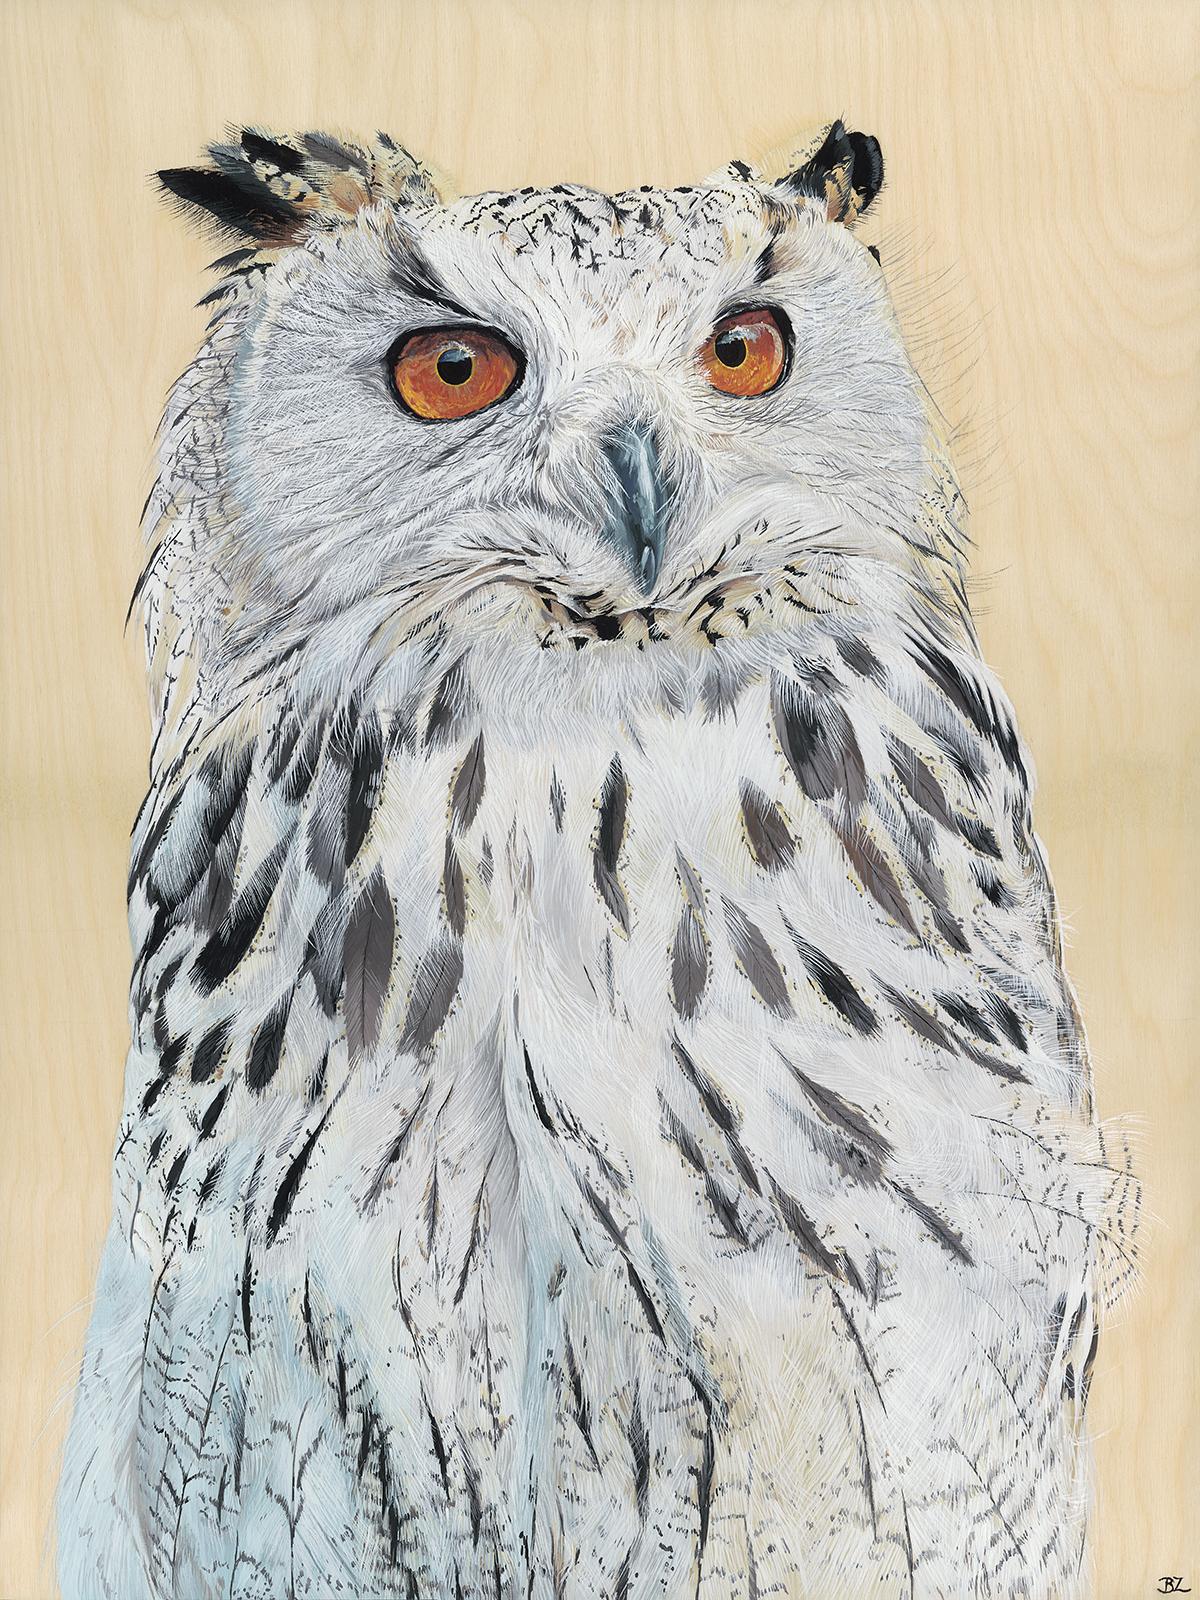 Bekah Zeimetz Owl 18 X 24 MF FINAL 1200pixels .jpg